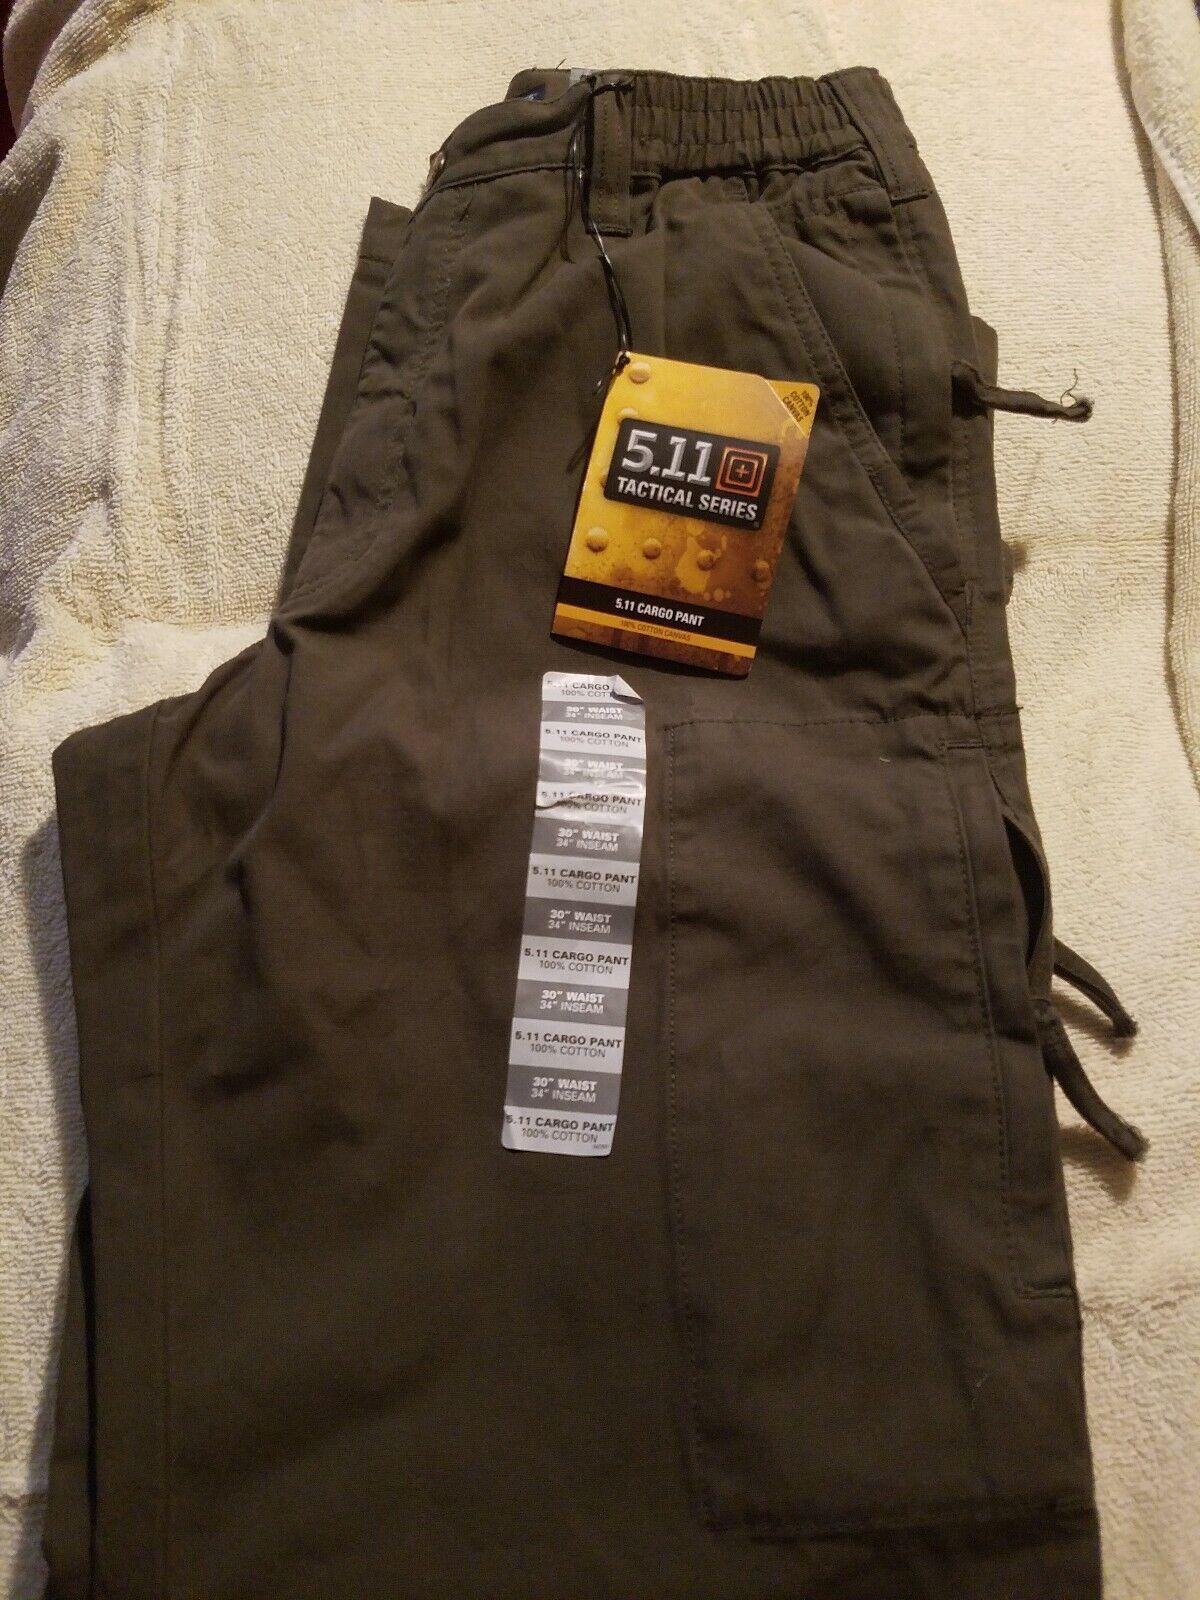 New 5.11 Tactical Series Men's Cargo Pant 30 34